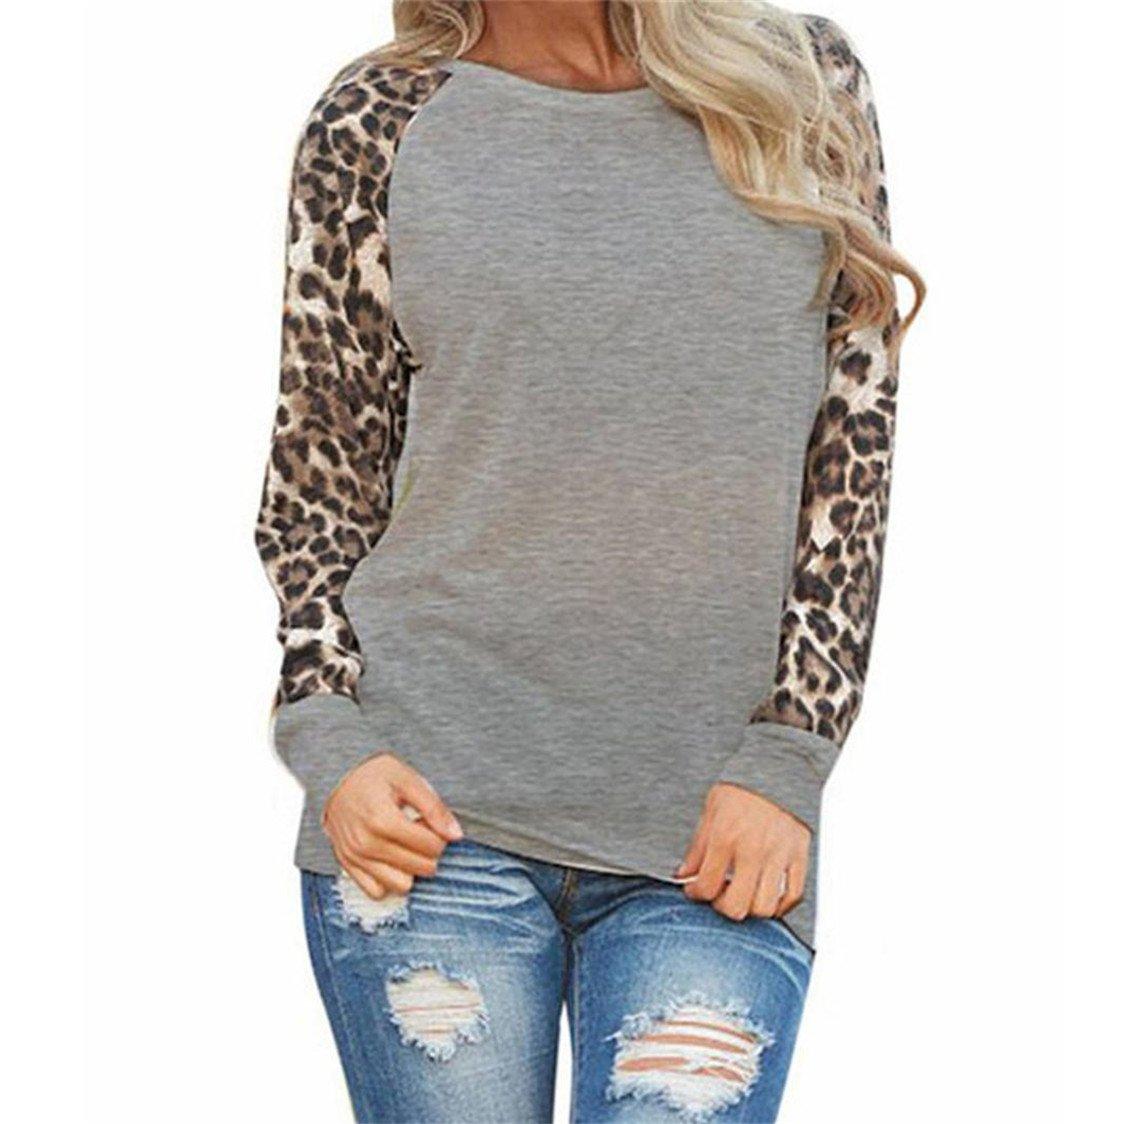 TIFENNY Fashion Womens Long Sleeve T-Shirt, Ladies Plus Size Leopard Blouse Oversize Tops(Gray,M) (XXXXXL, Gray)